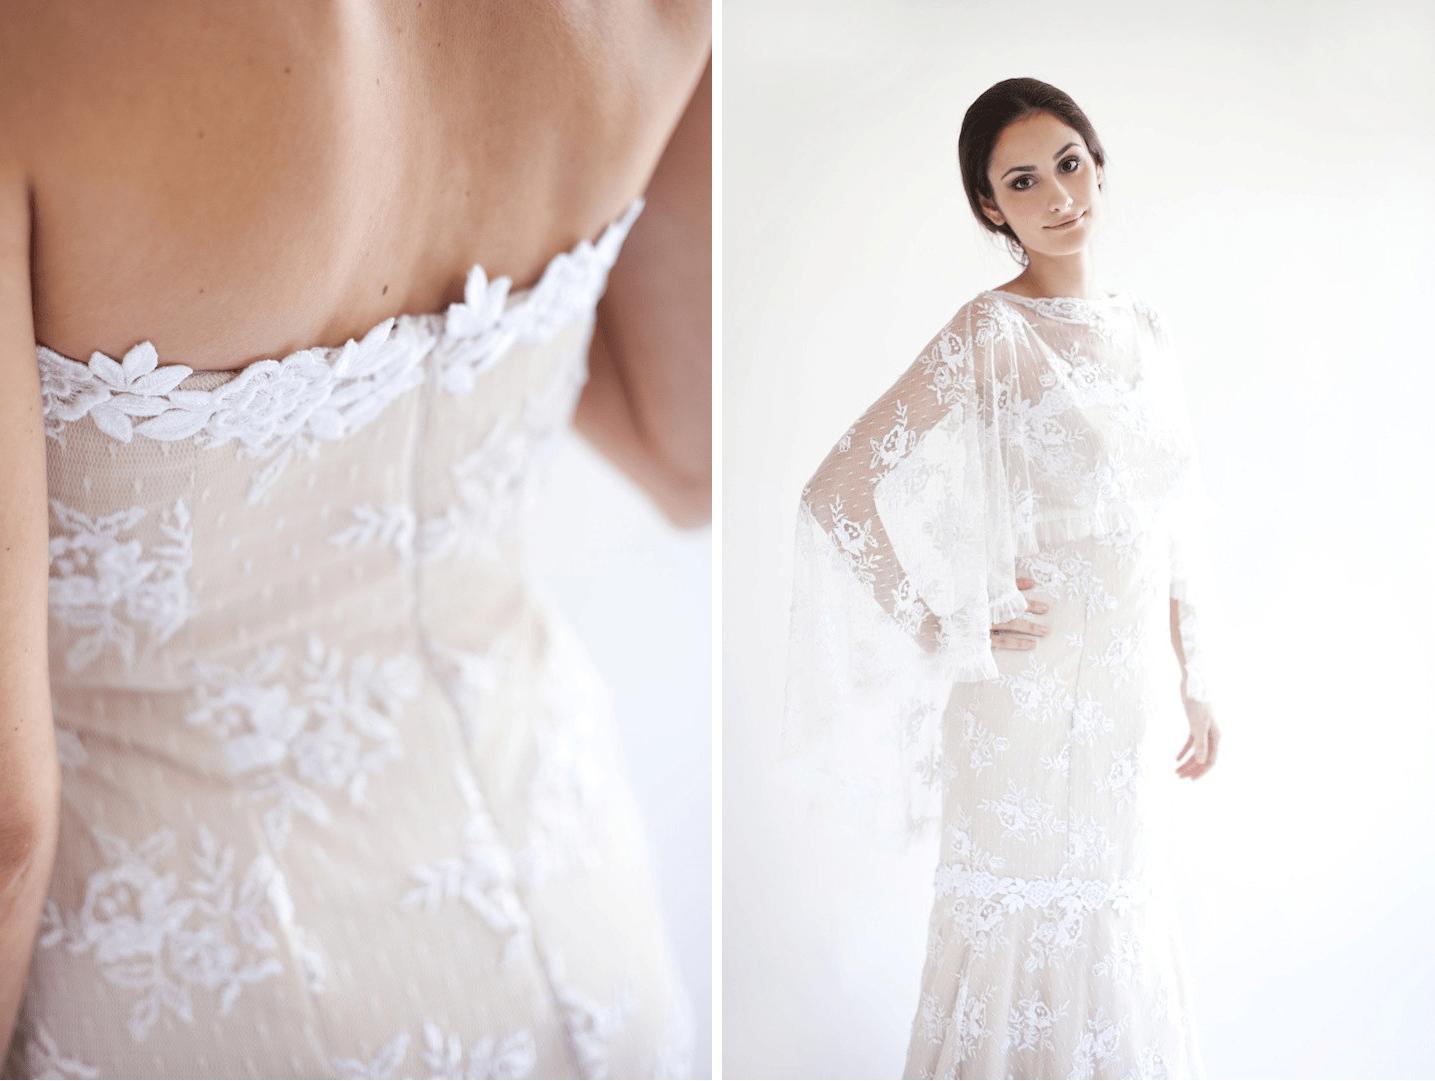 Beige With White Lace Handmade Wedding Dress